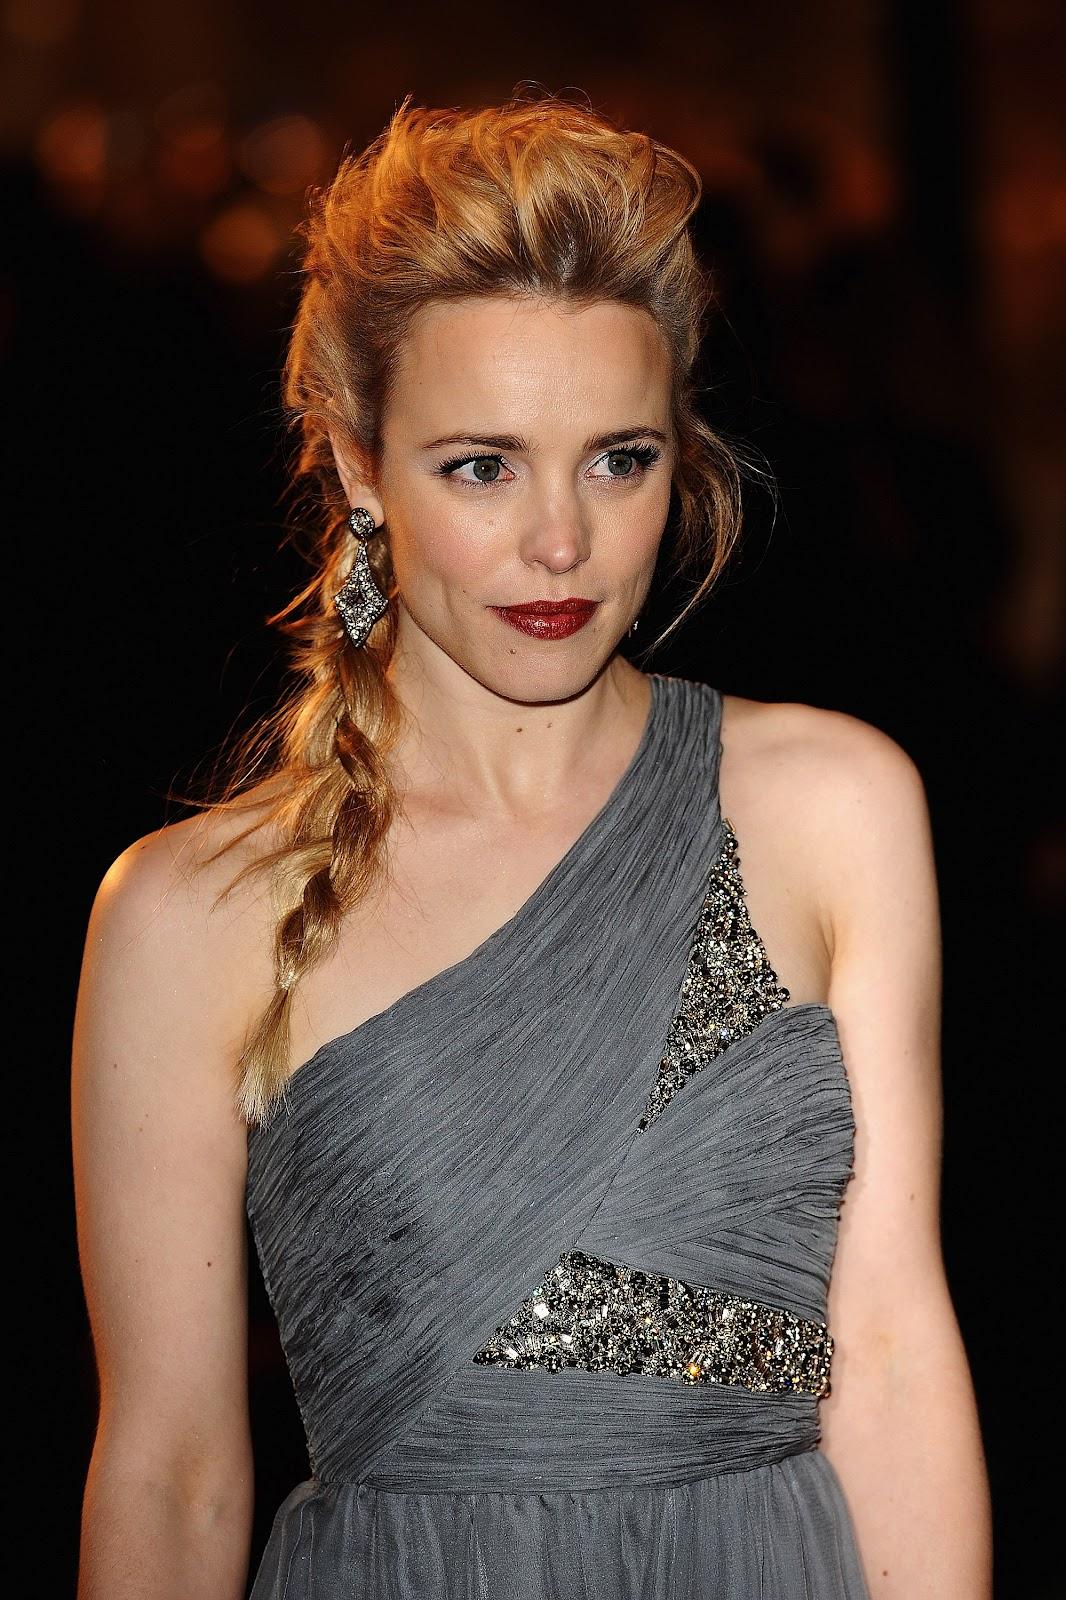 Rachel Mcadams Special Pictures 3 Film Actresses